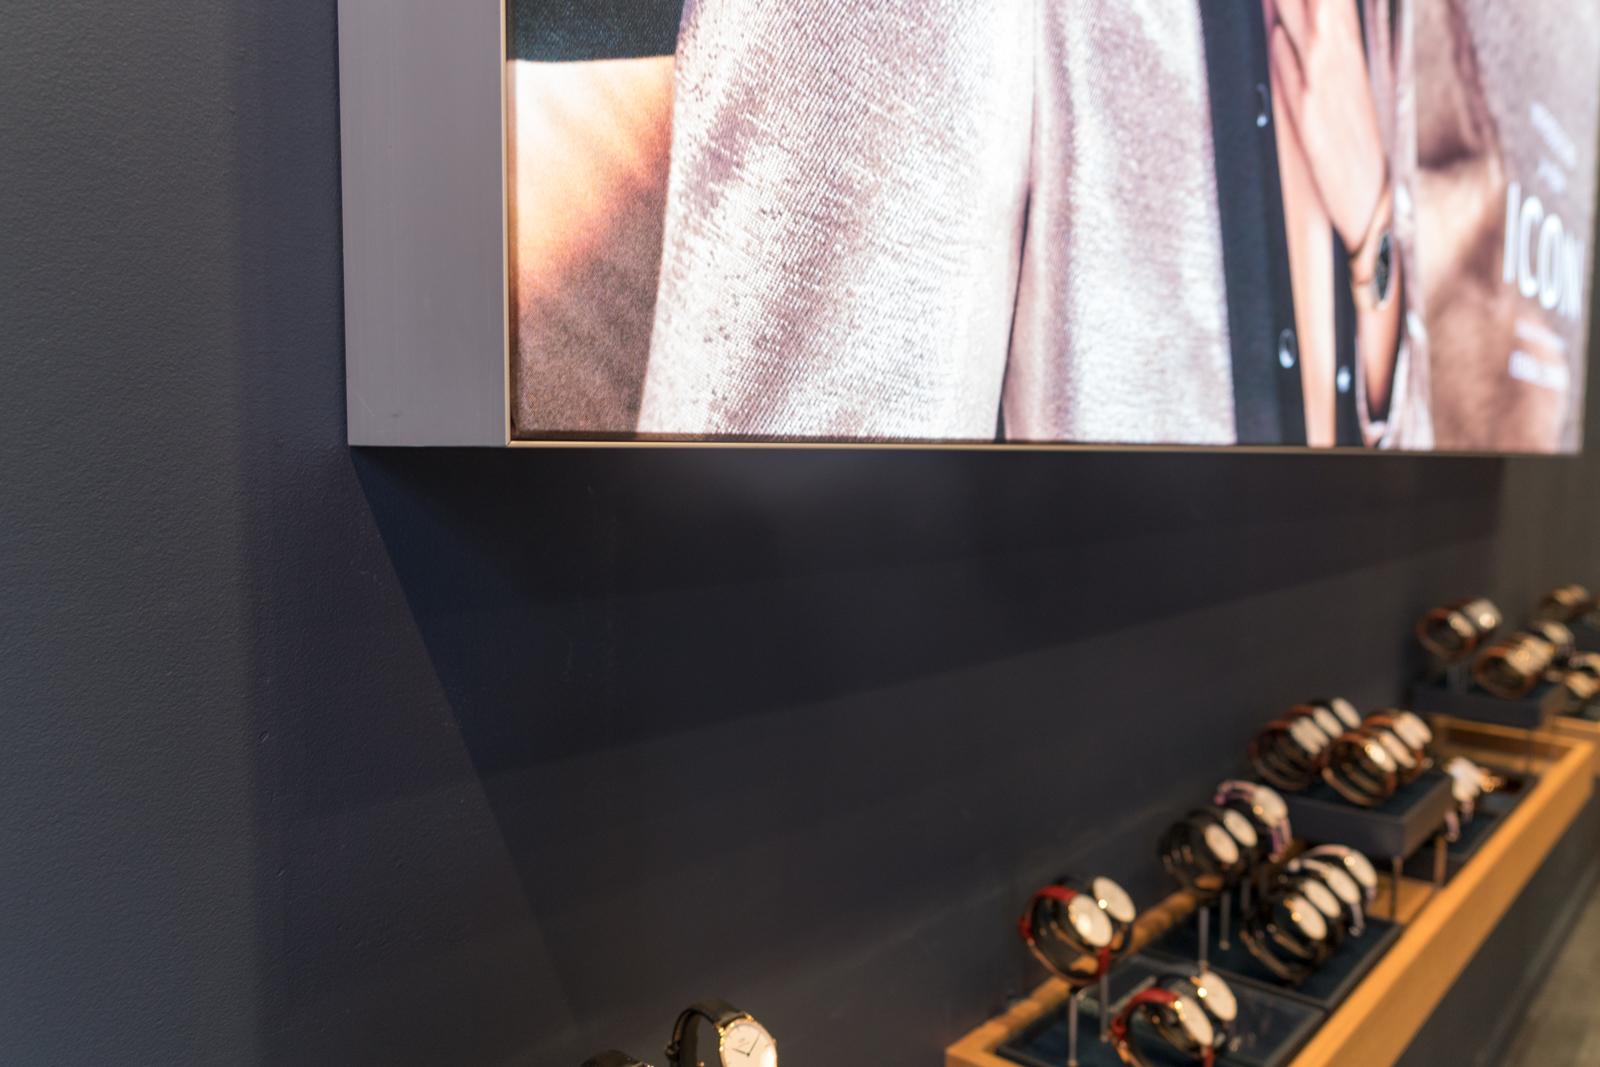 signage backlit fabric SEG frameless edgeless LED pop-up store shopping stretch fabric tension silicone edge graphics